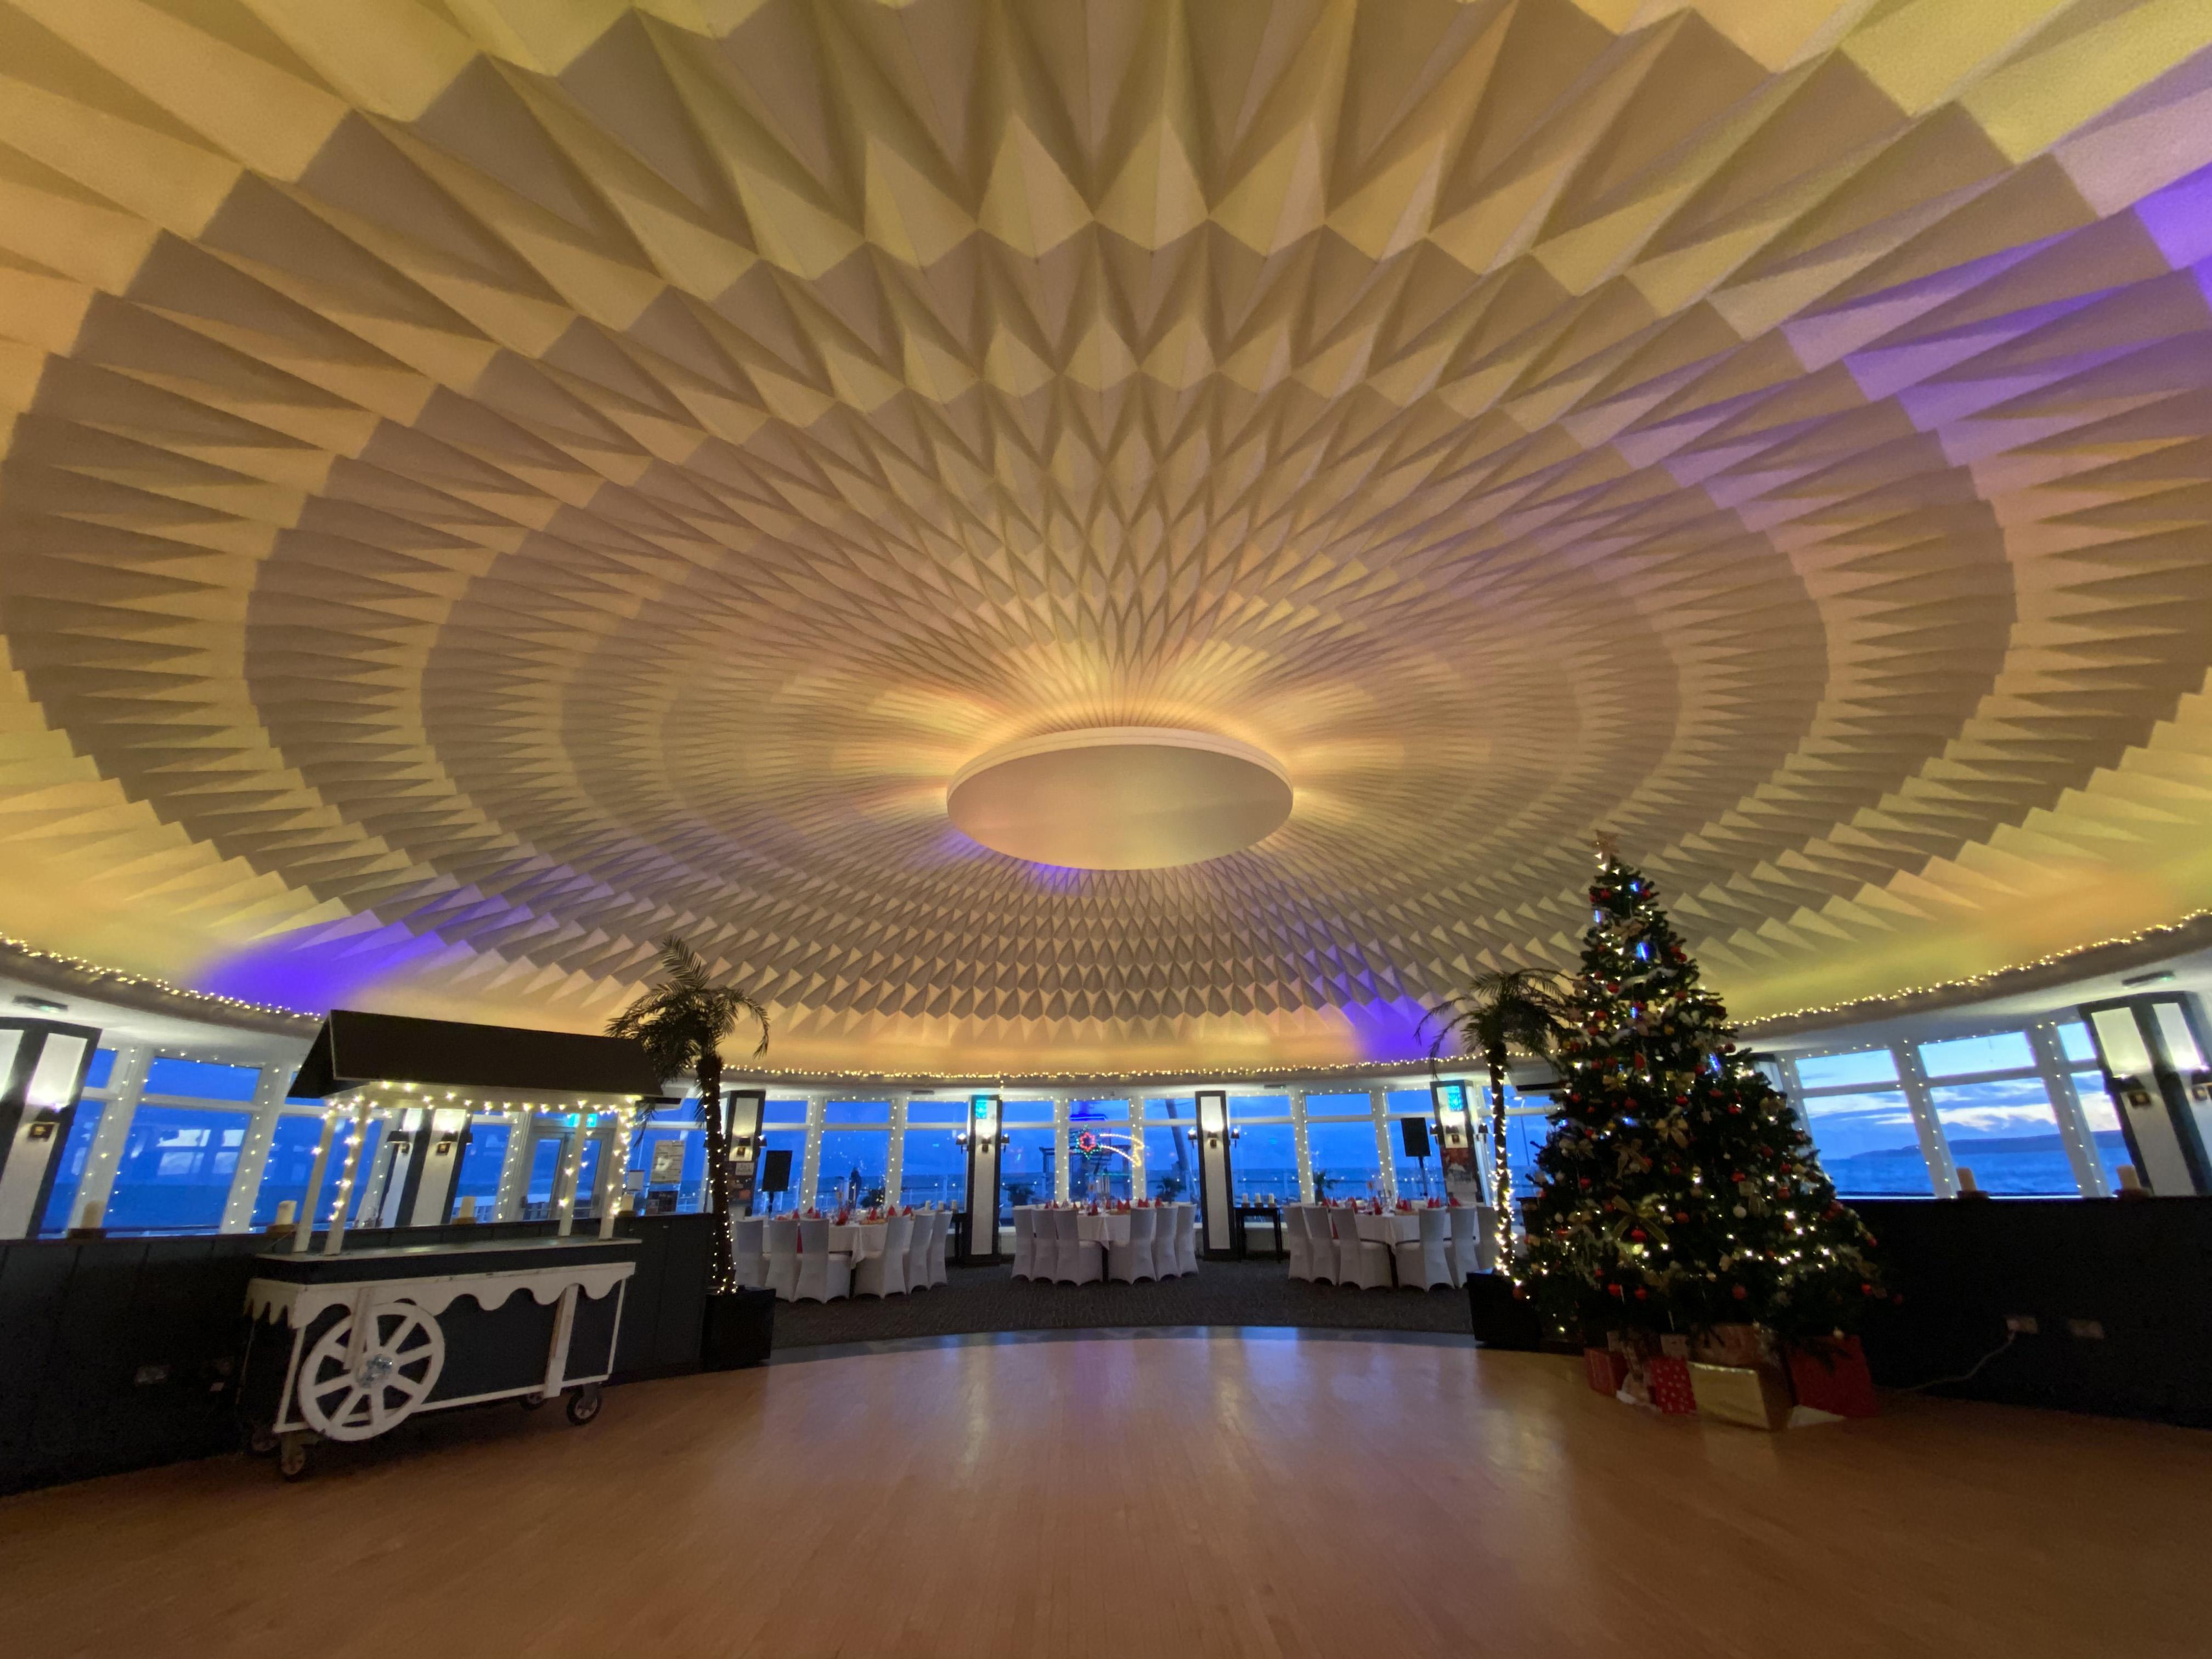 Key West Dance Floor & Lighted Ceiling